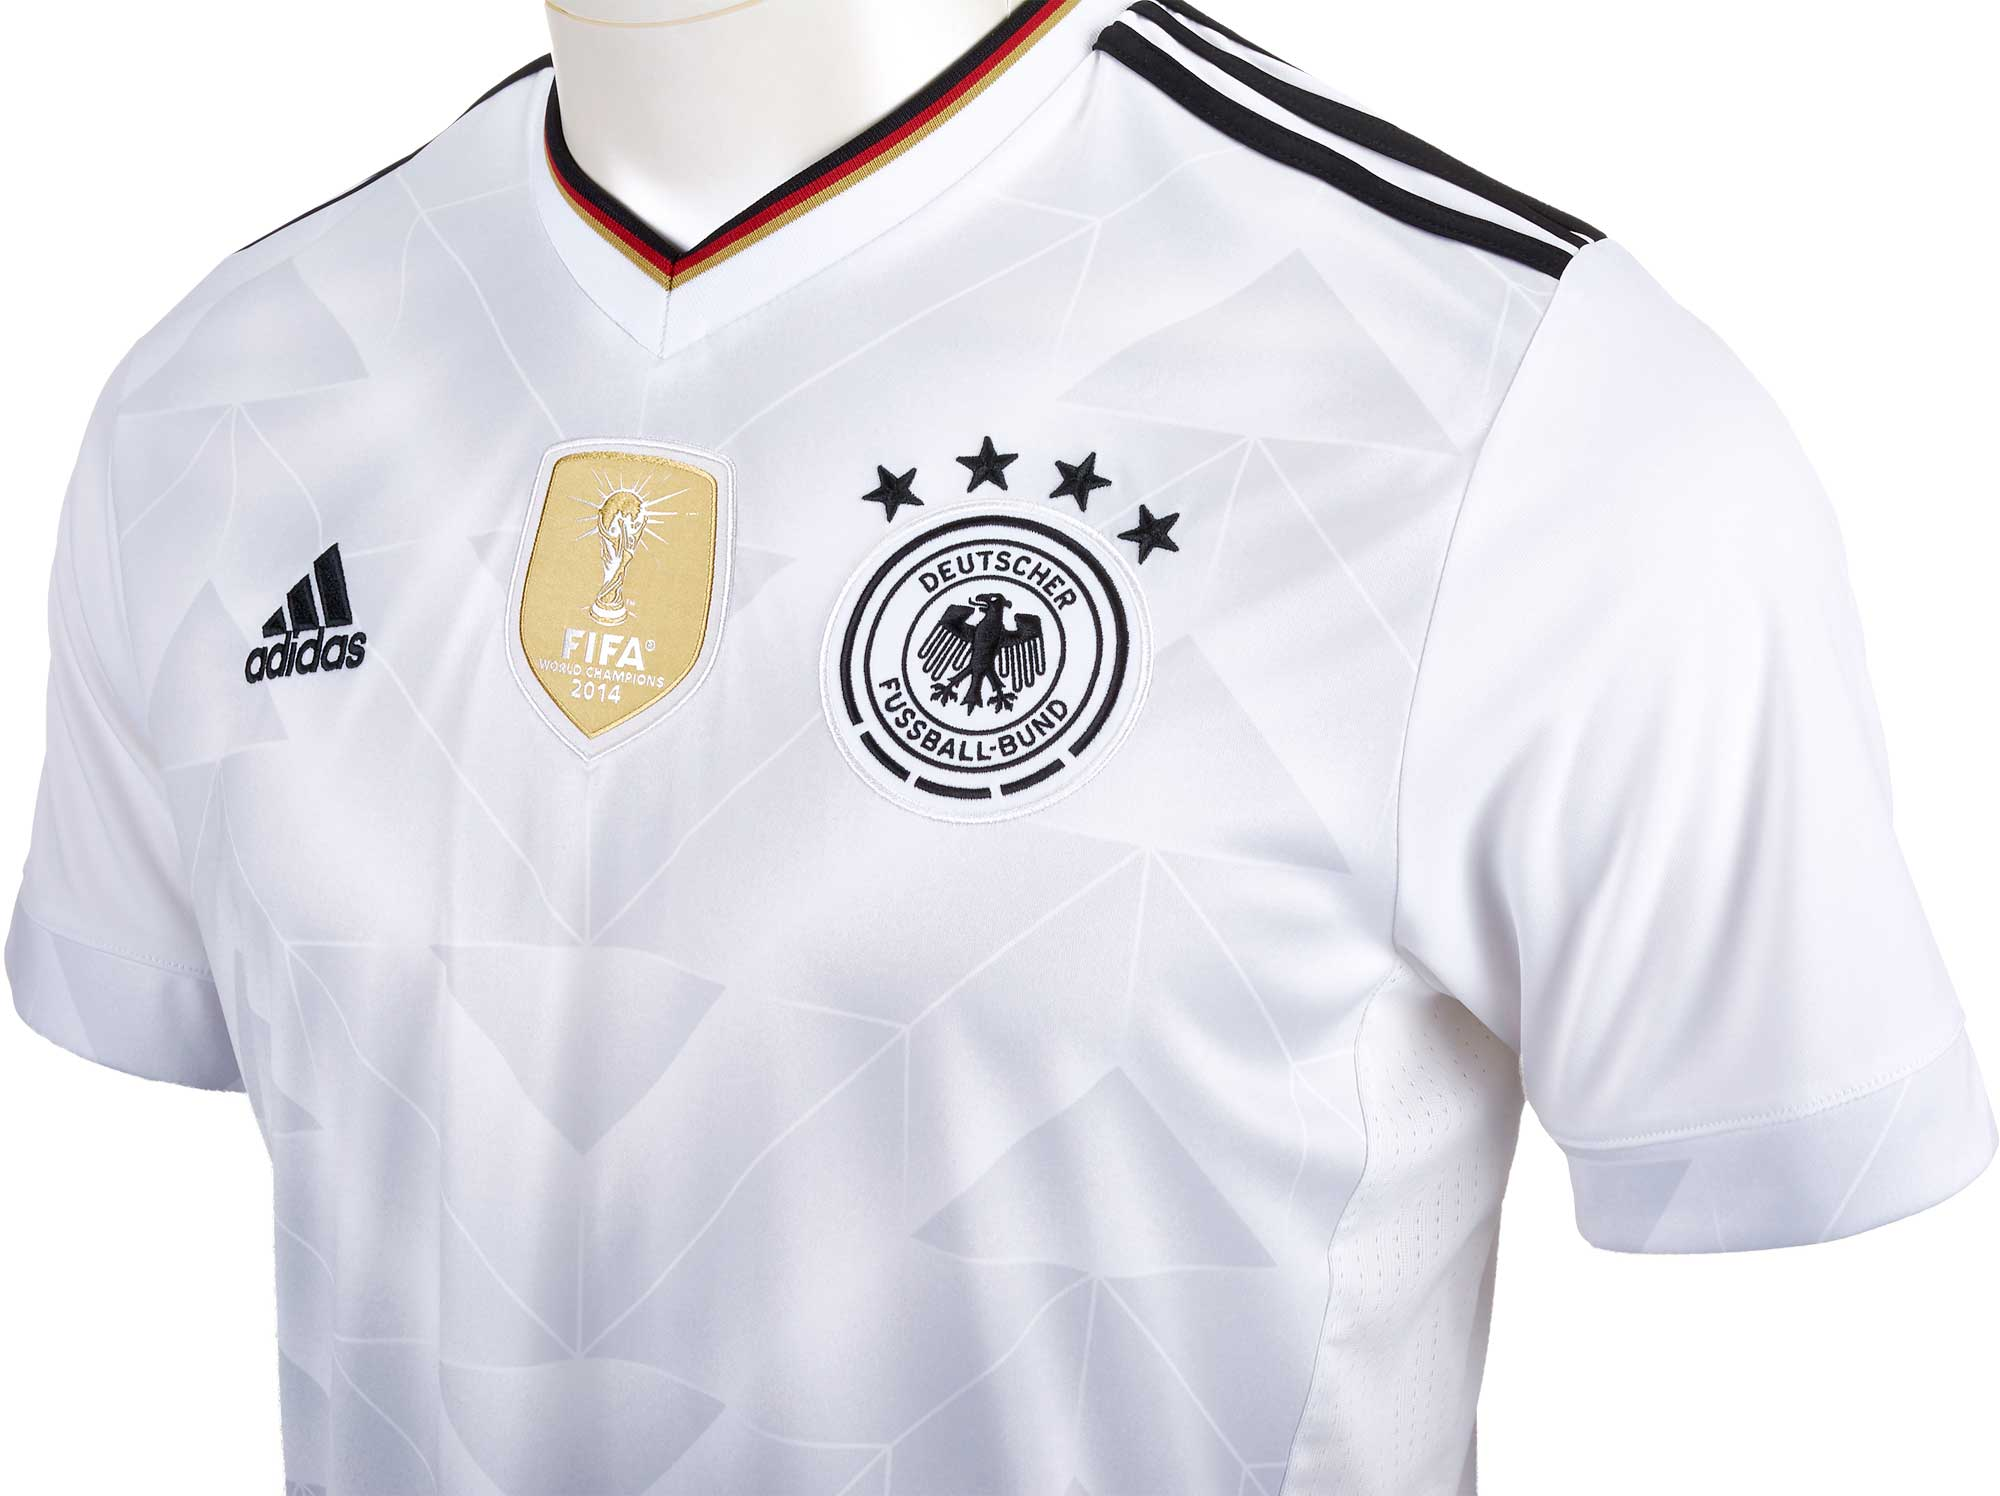 adidas Youth Germany Home Jersey - 2016 Kids Germany Jerseys